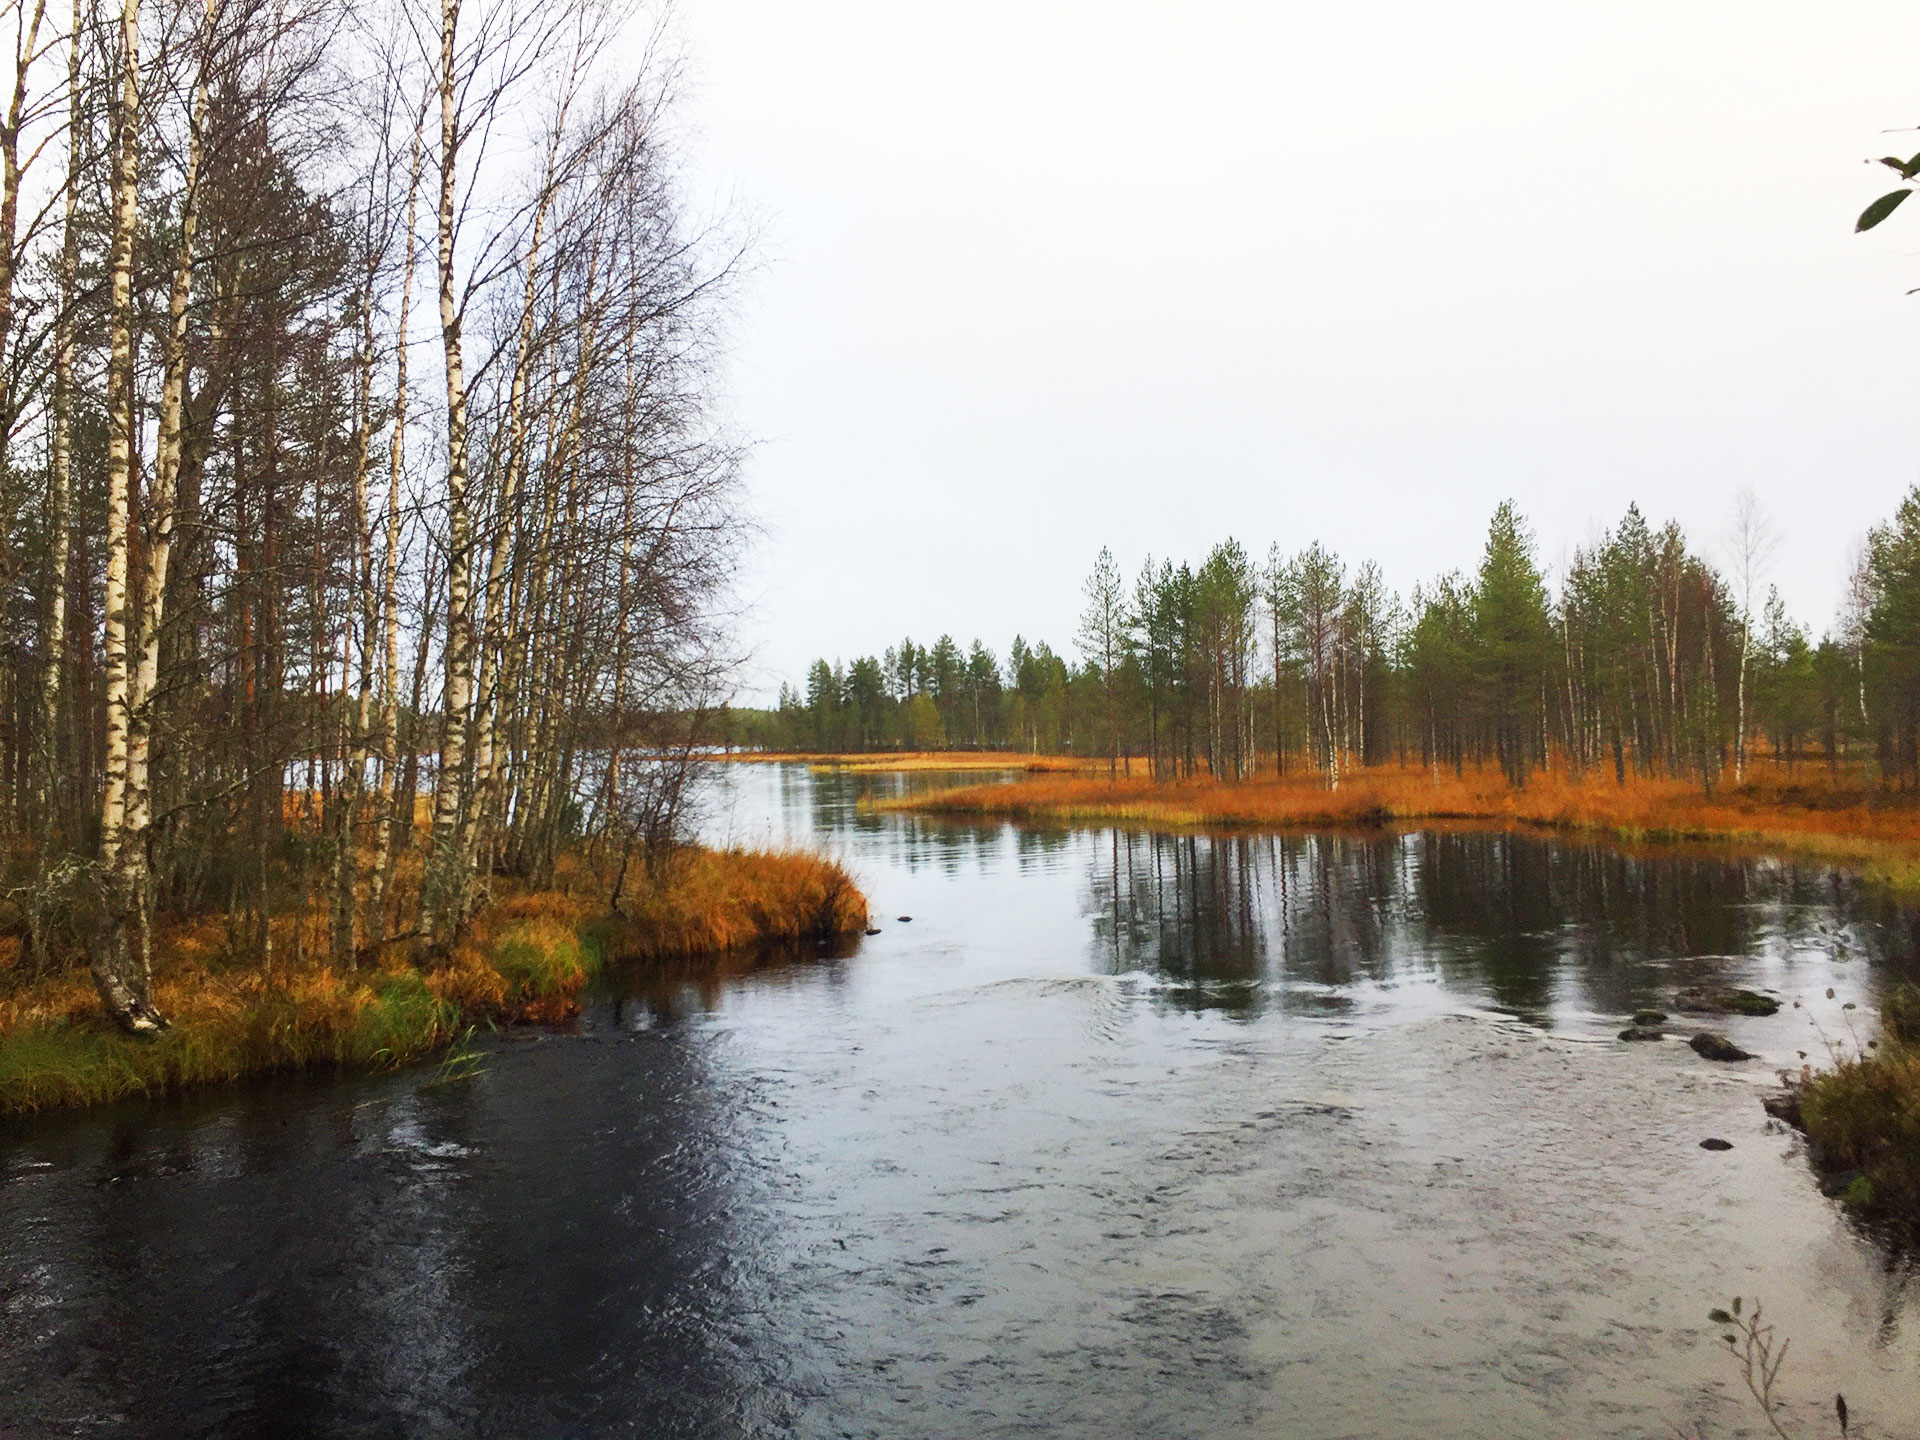 Tiilikkajärvi National Park - kayaking landscapes